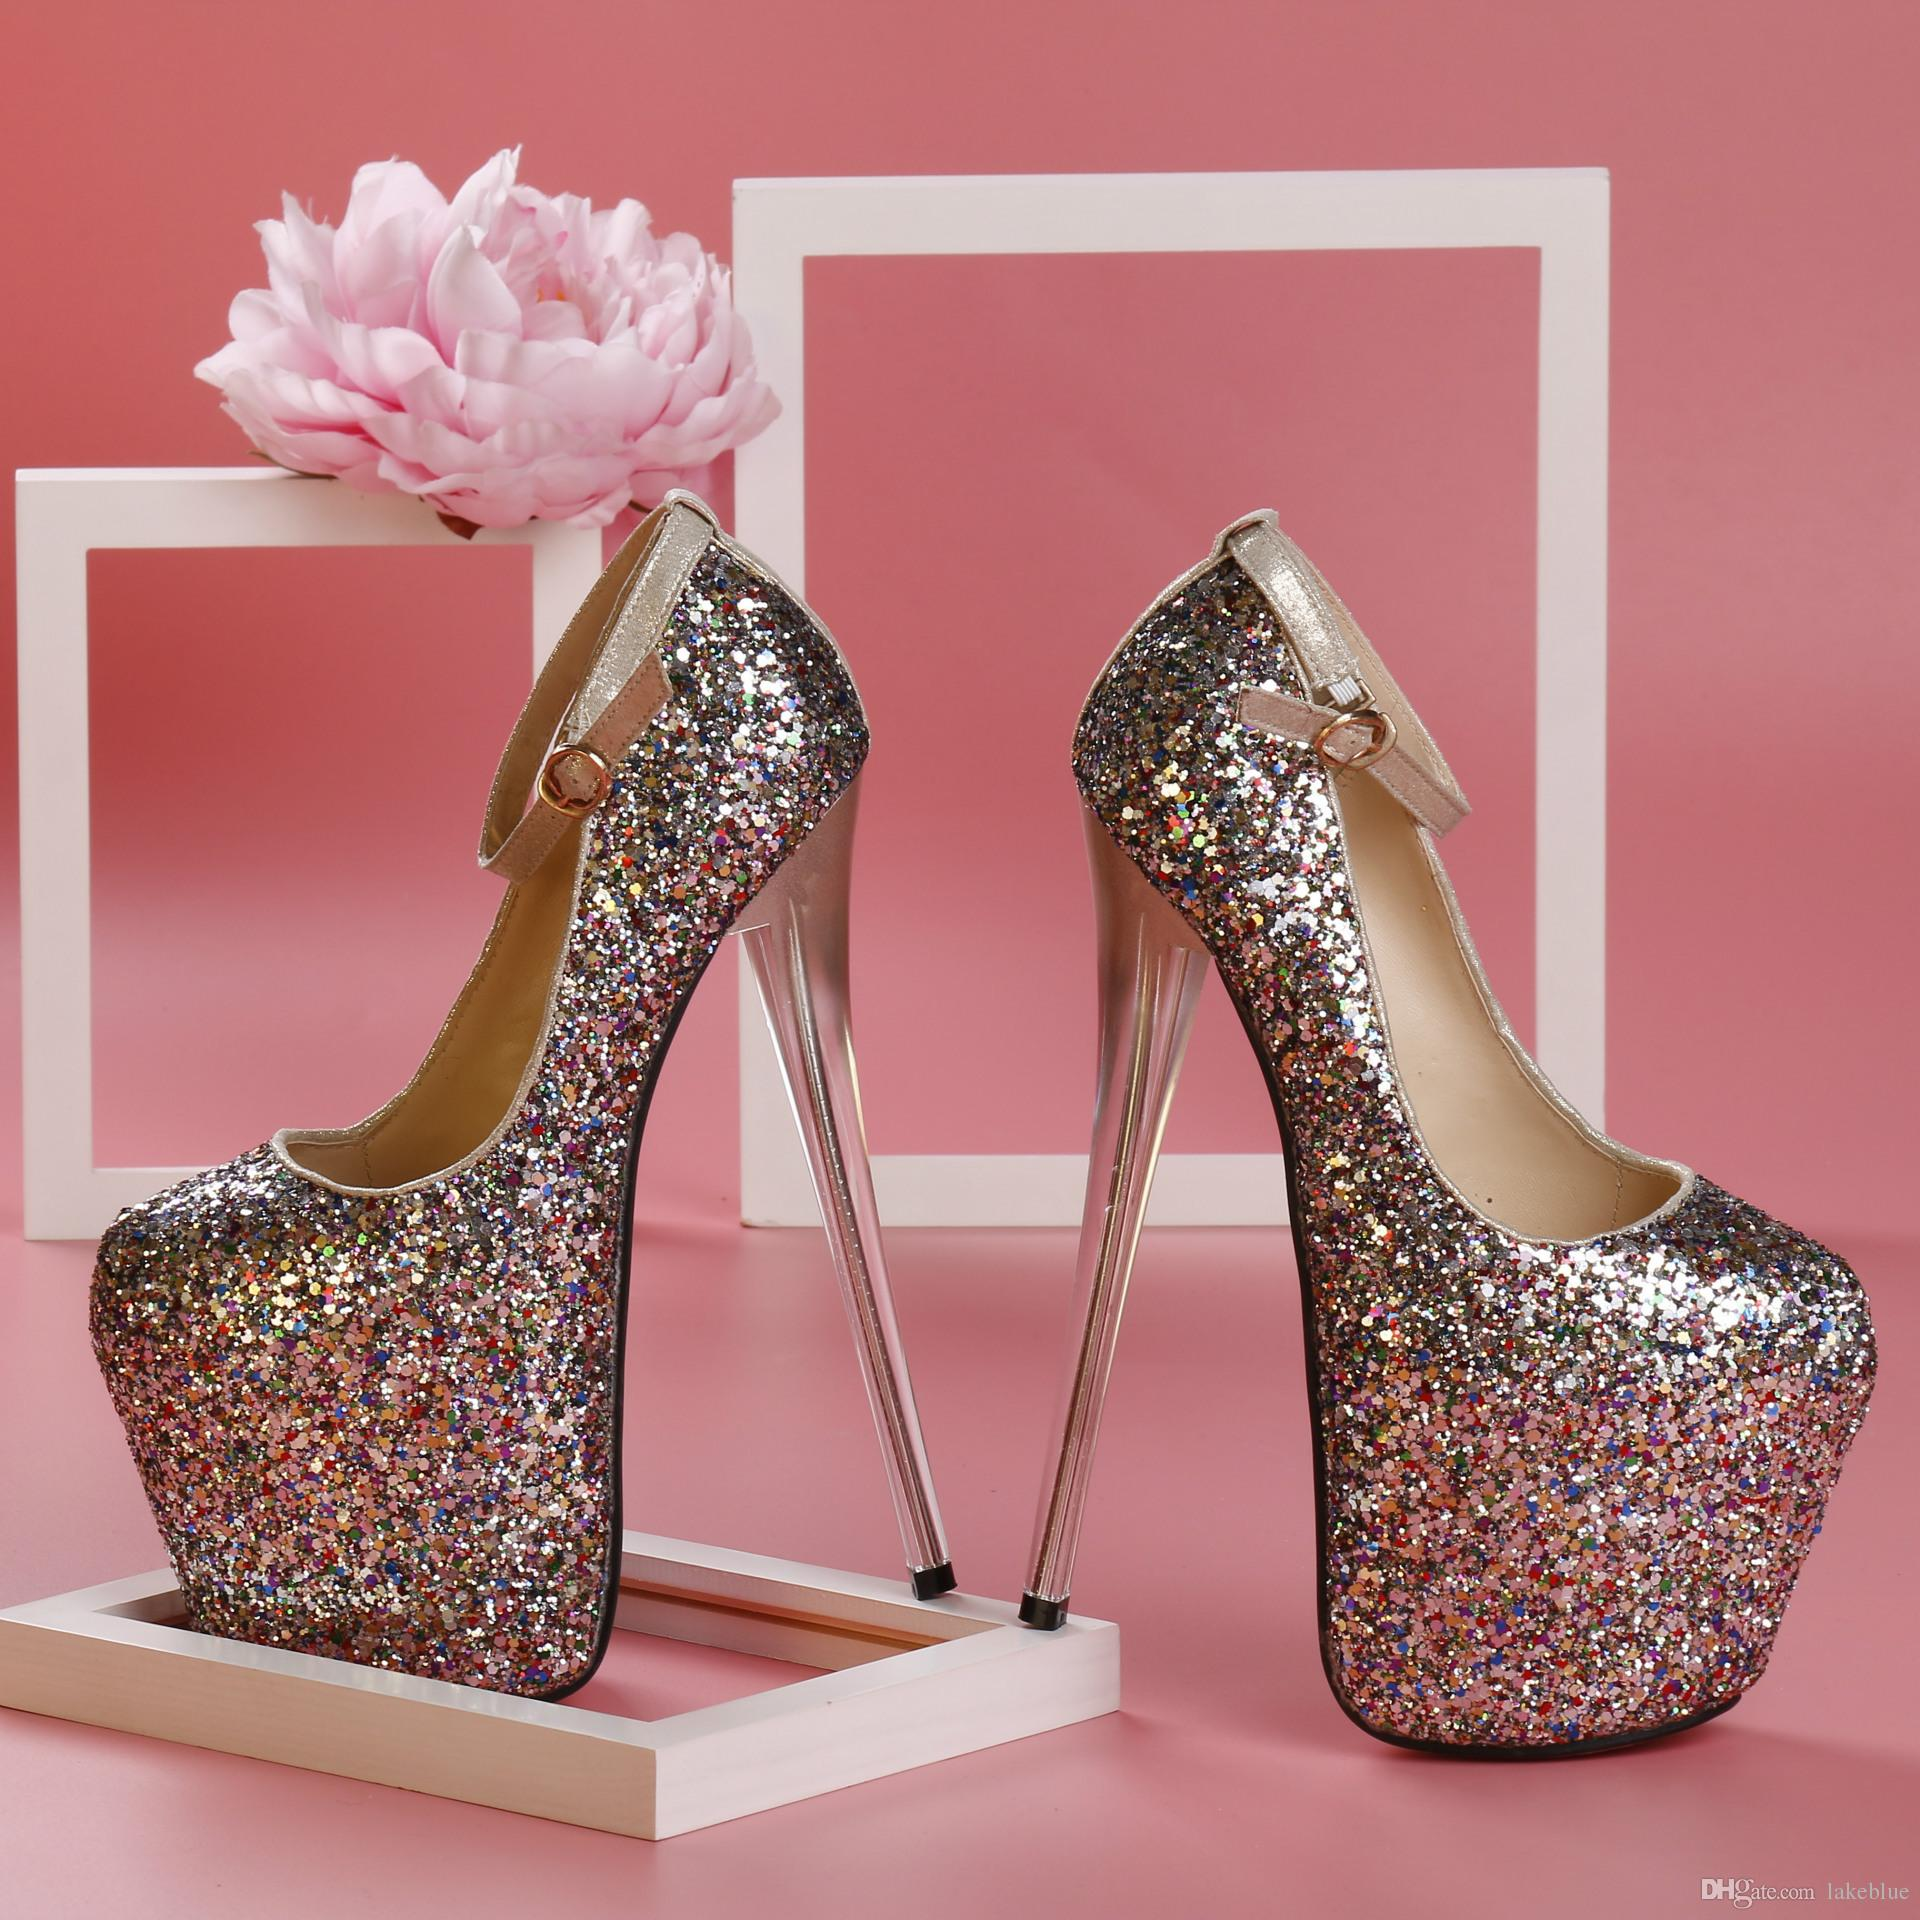 2016 Ladies Leather Super 20cm High Heel Sandals 9cm Platform Silver Heels  Sexy Glitter Dance Party Rolado Buckle Dress 34-43 Super High Heel 20cm  High Heel ... 588367ea12ed